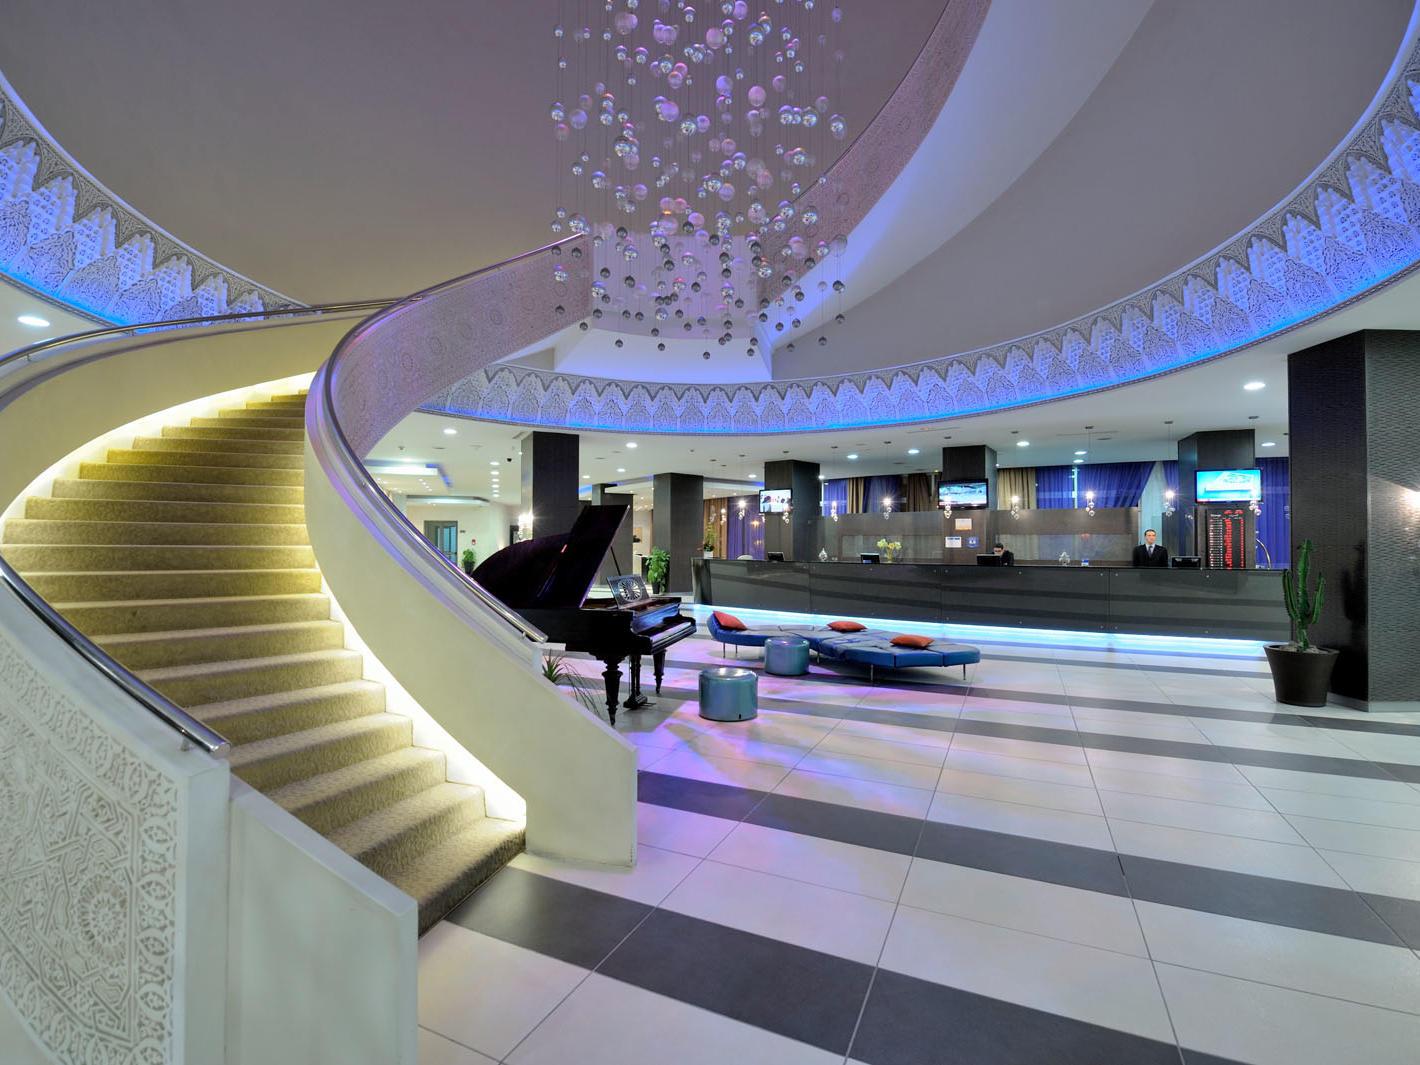 Lobby at Kenzi Solazur Hotel in Tangier, Morocco